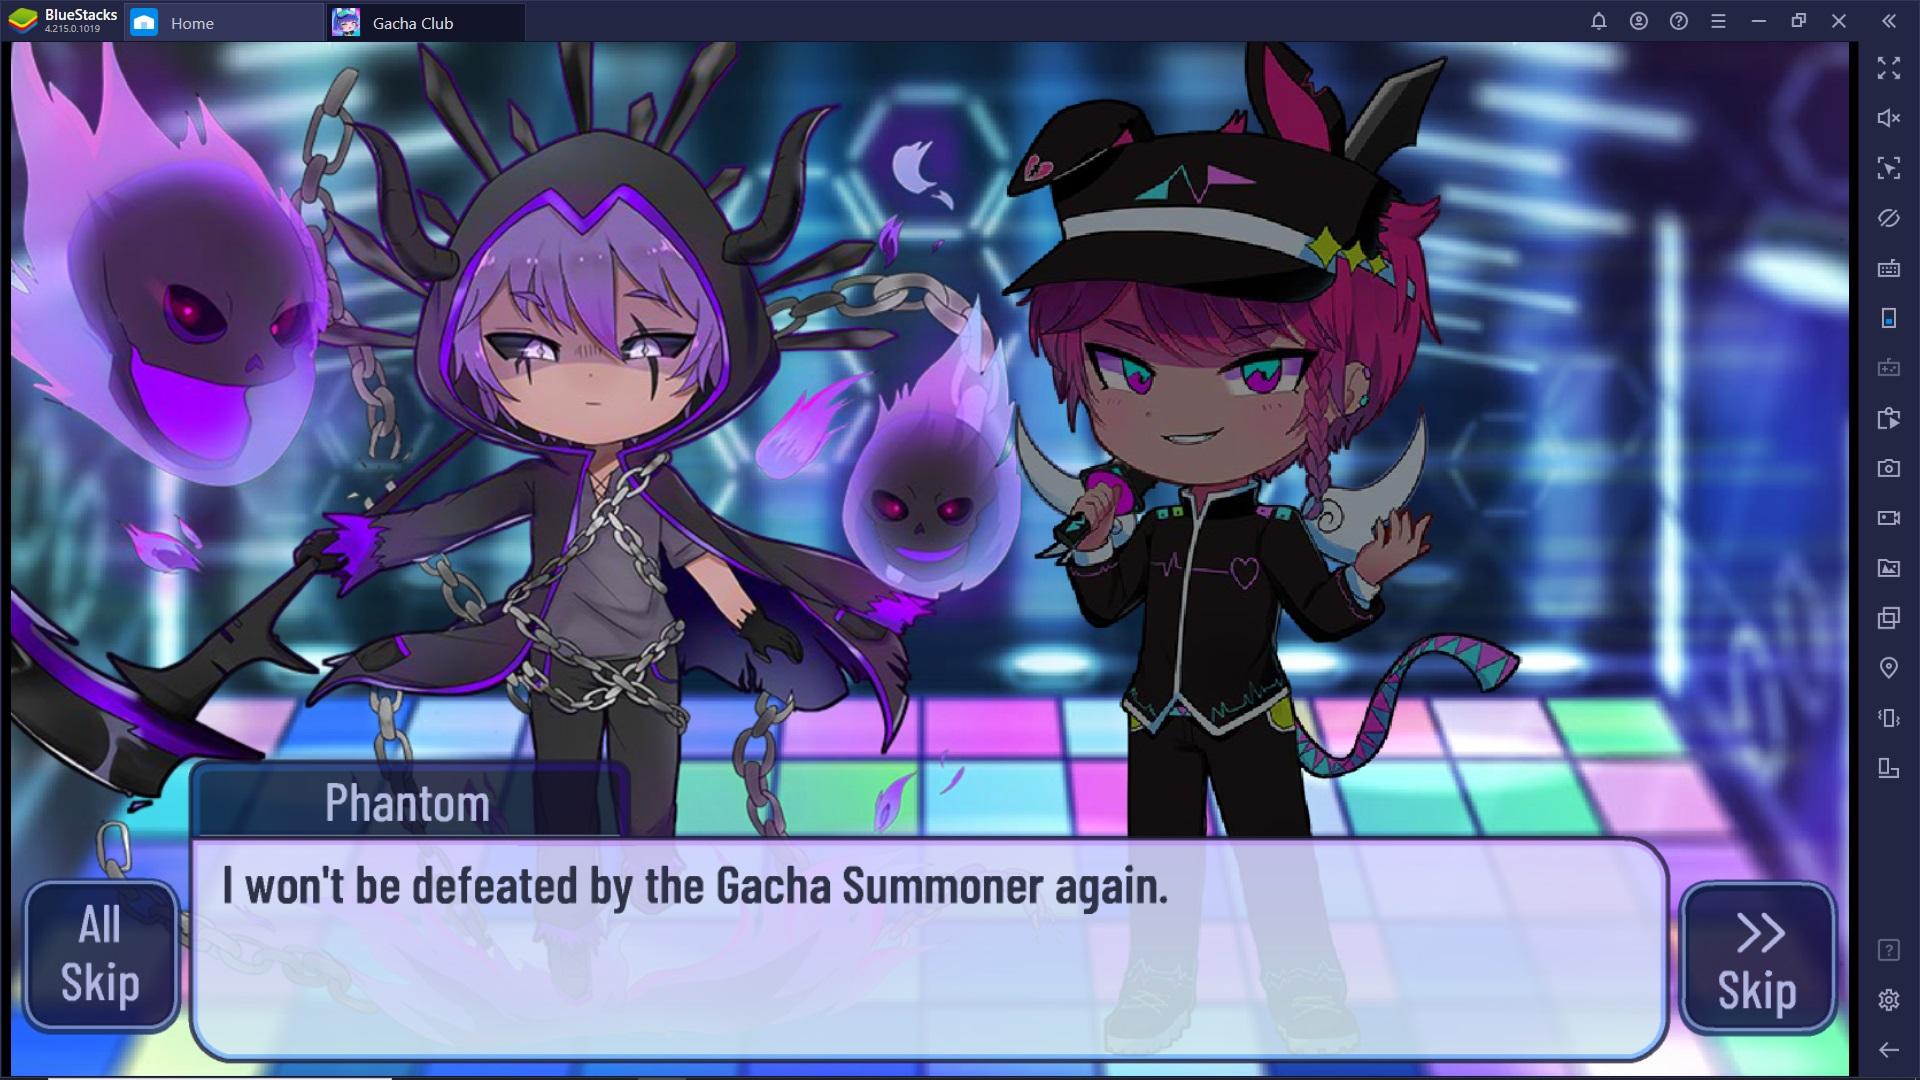 Gacha Club – Introduzione per i nuovi giocatori